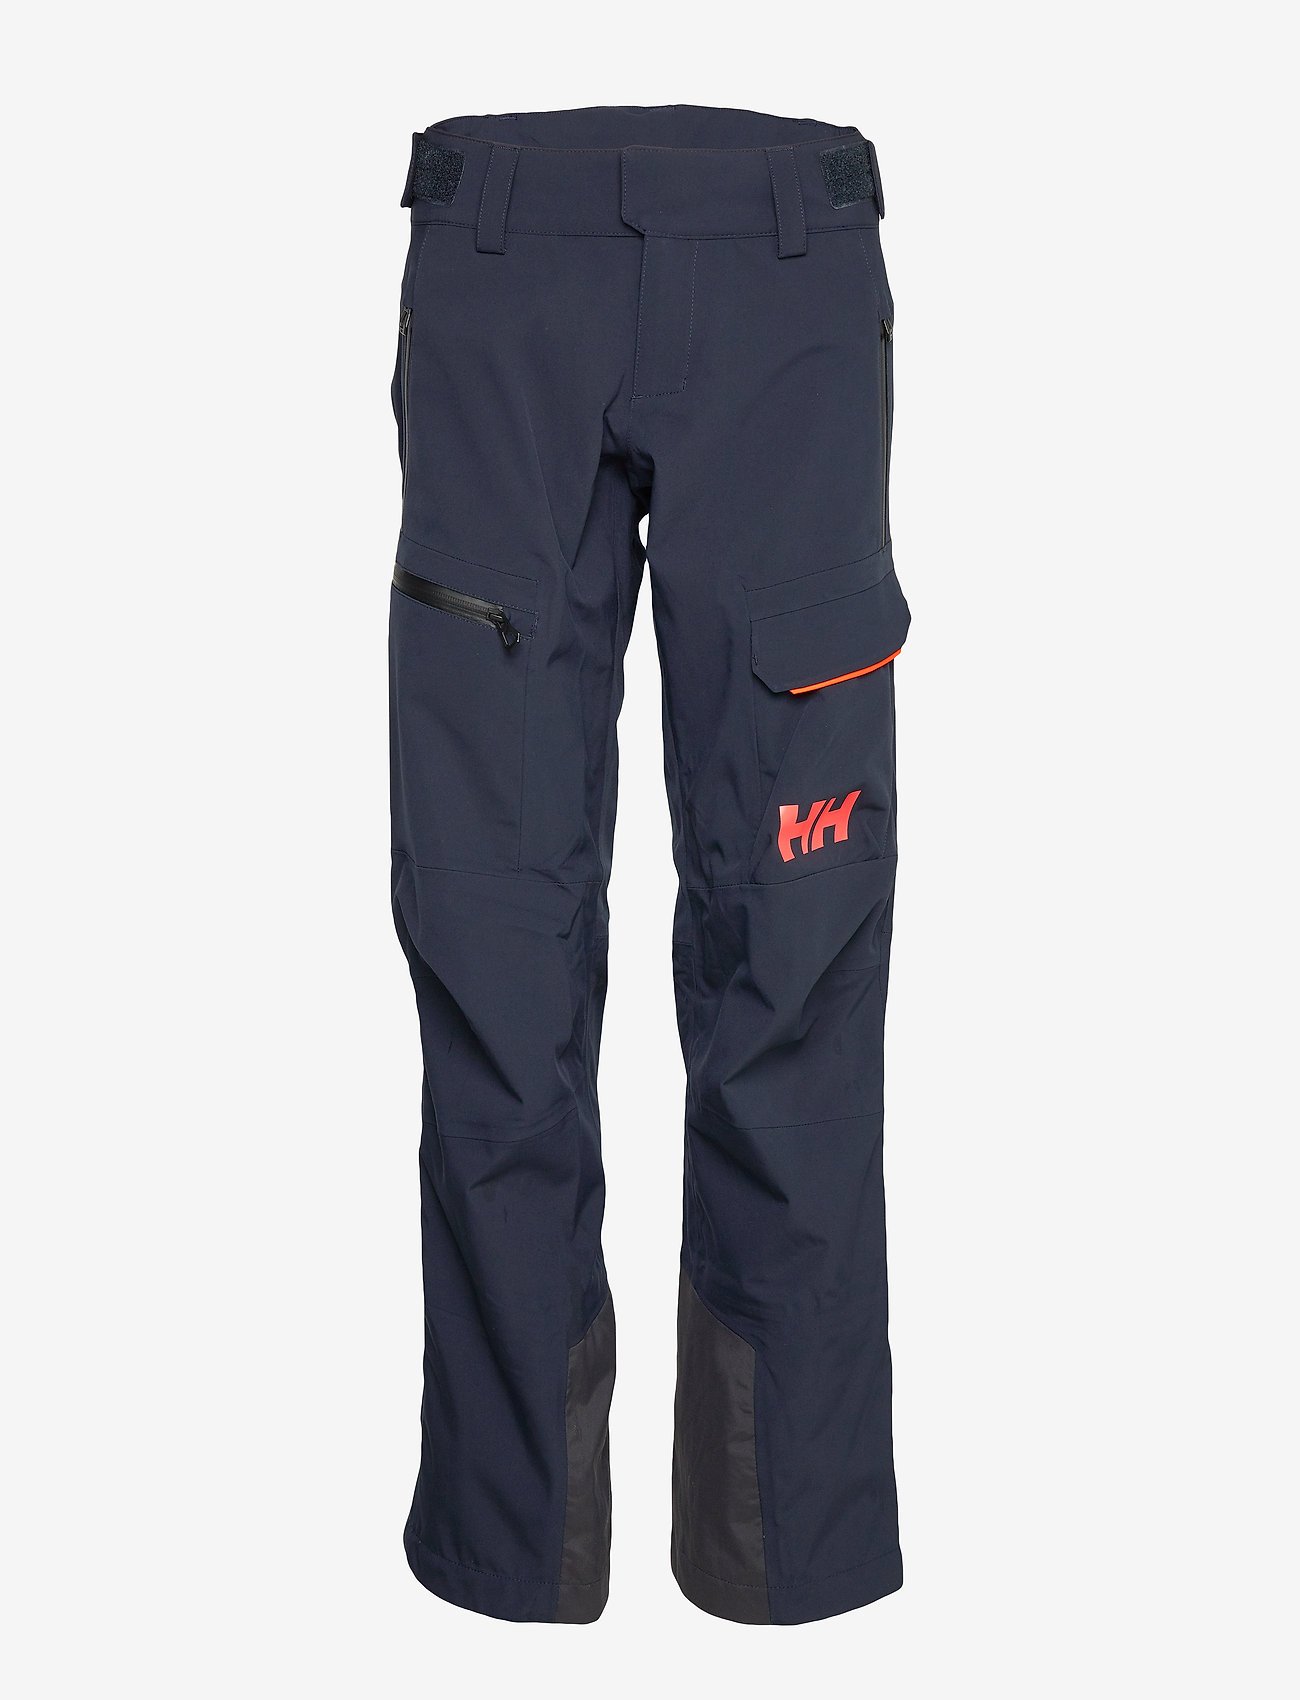 Helly Hansen - W AURORA SHELL 2.0 PANT - shell pants - navy - 1